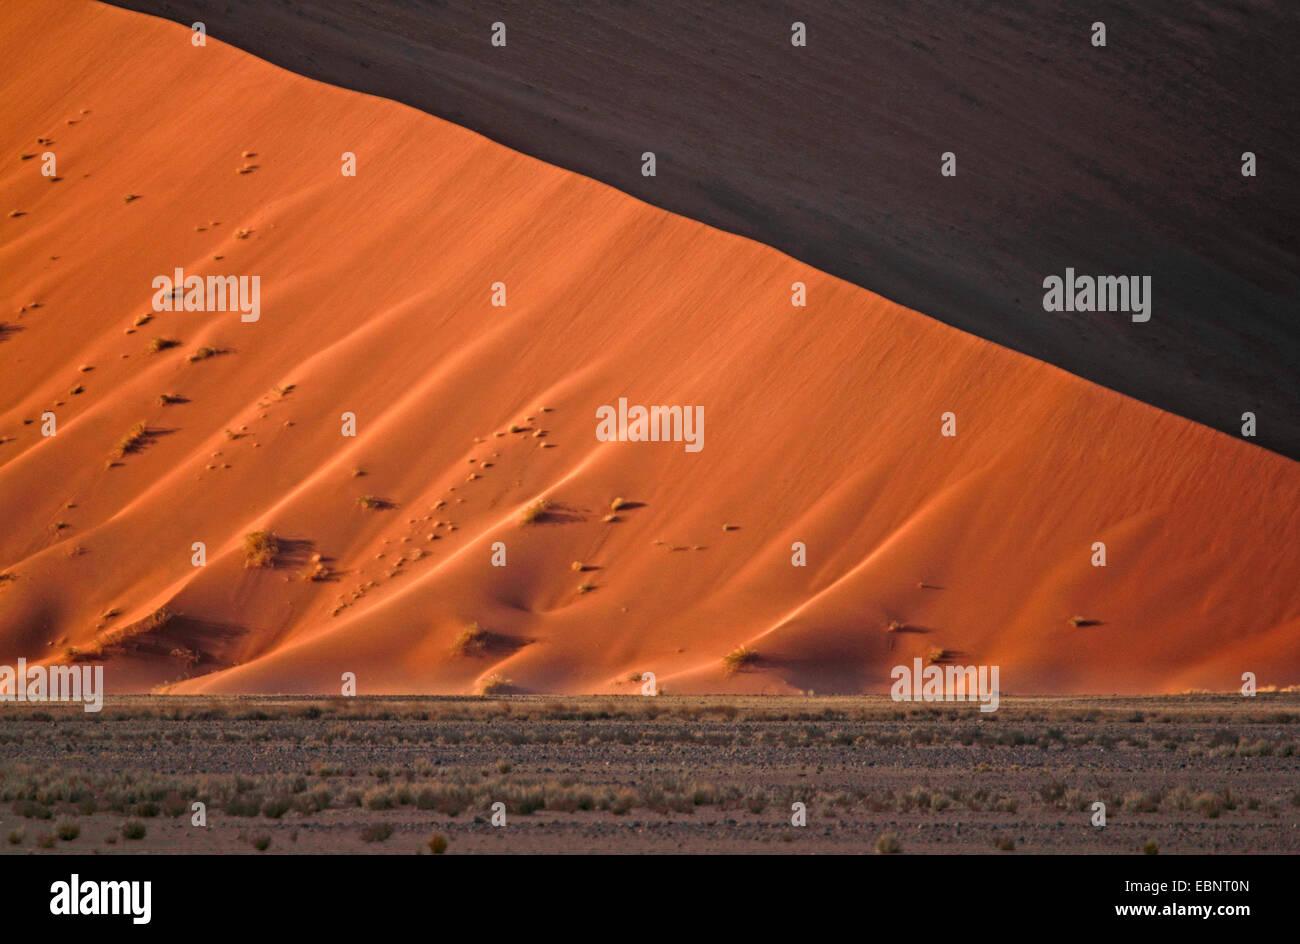 sand dune of the namib desert, Namibia, Namib Naukluft National Park, Sossusvlei - Stock Image